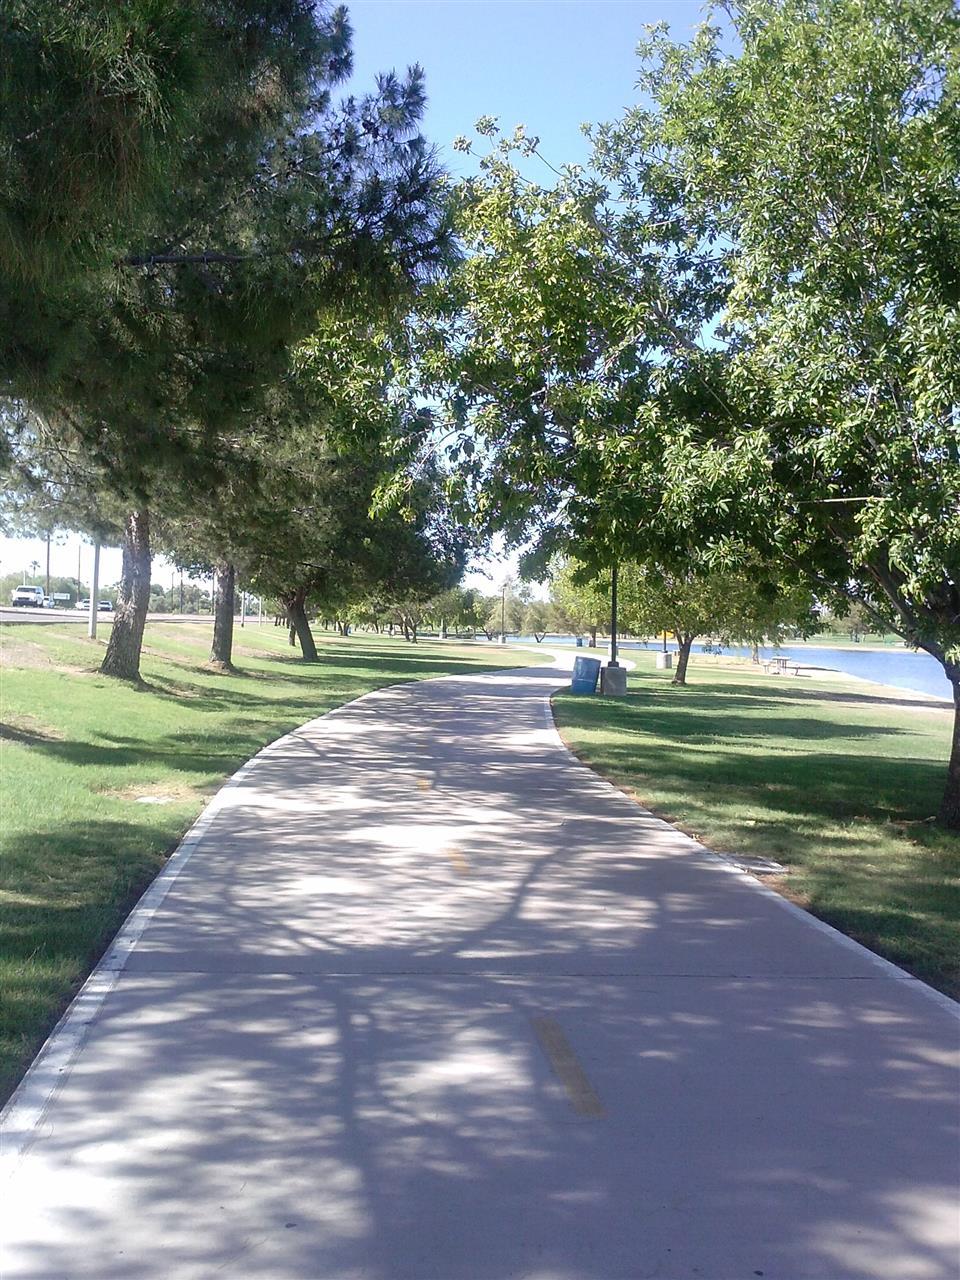 Chaparral Park Bike Path (Scottsdale, AZ)